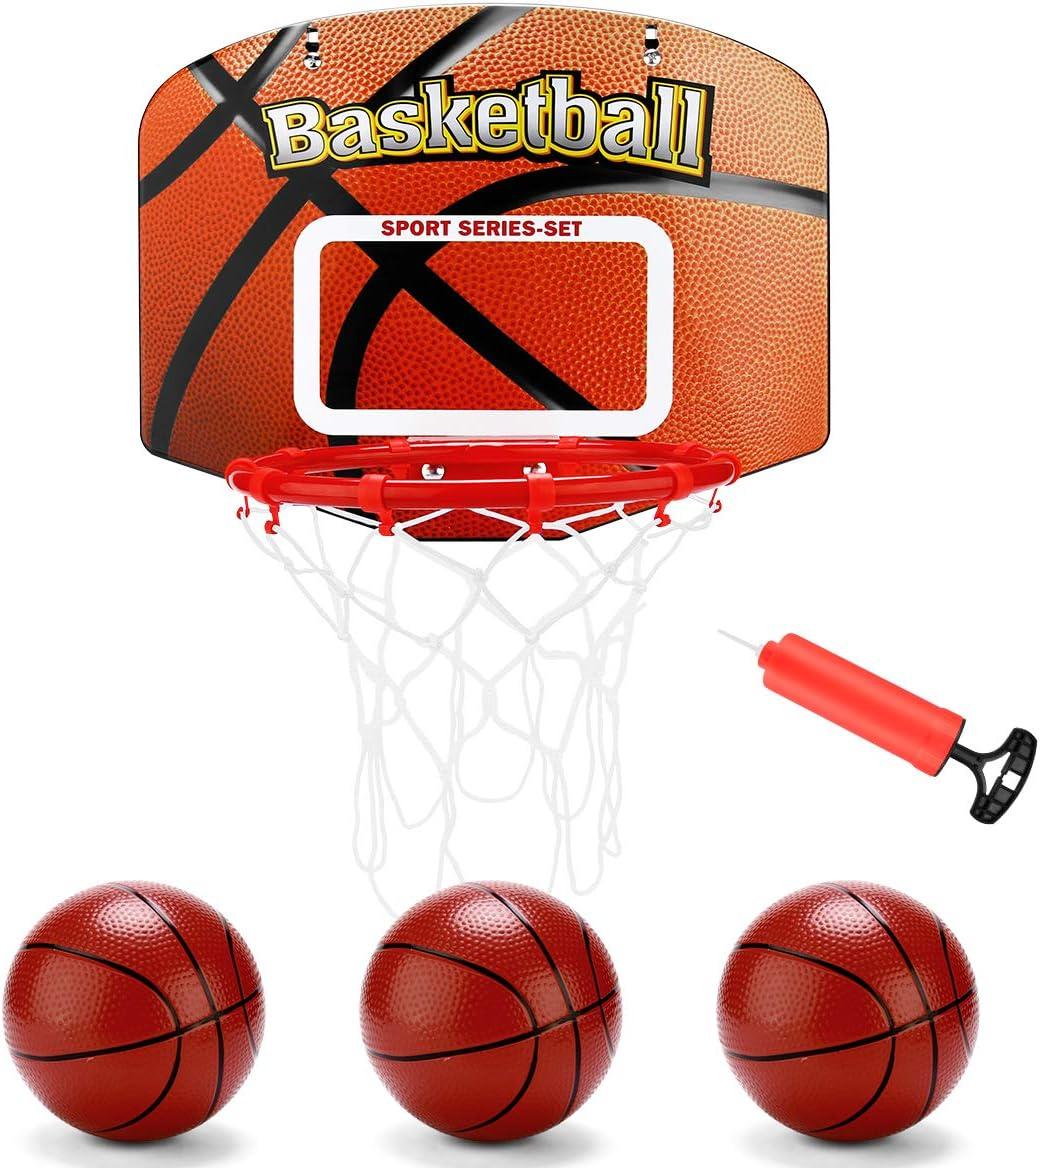 Basketball Toy Set for Kids Indoor Sports Equipment Net Hoop Ball D